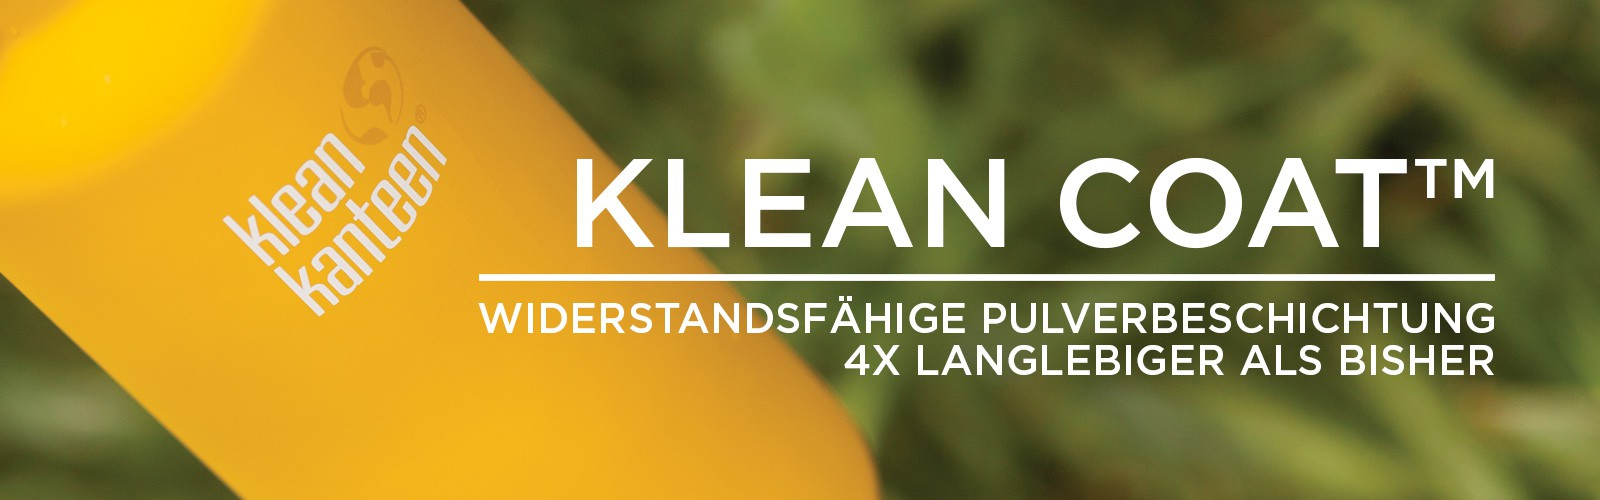 kleancoat-01_1920x1920